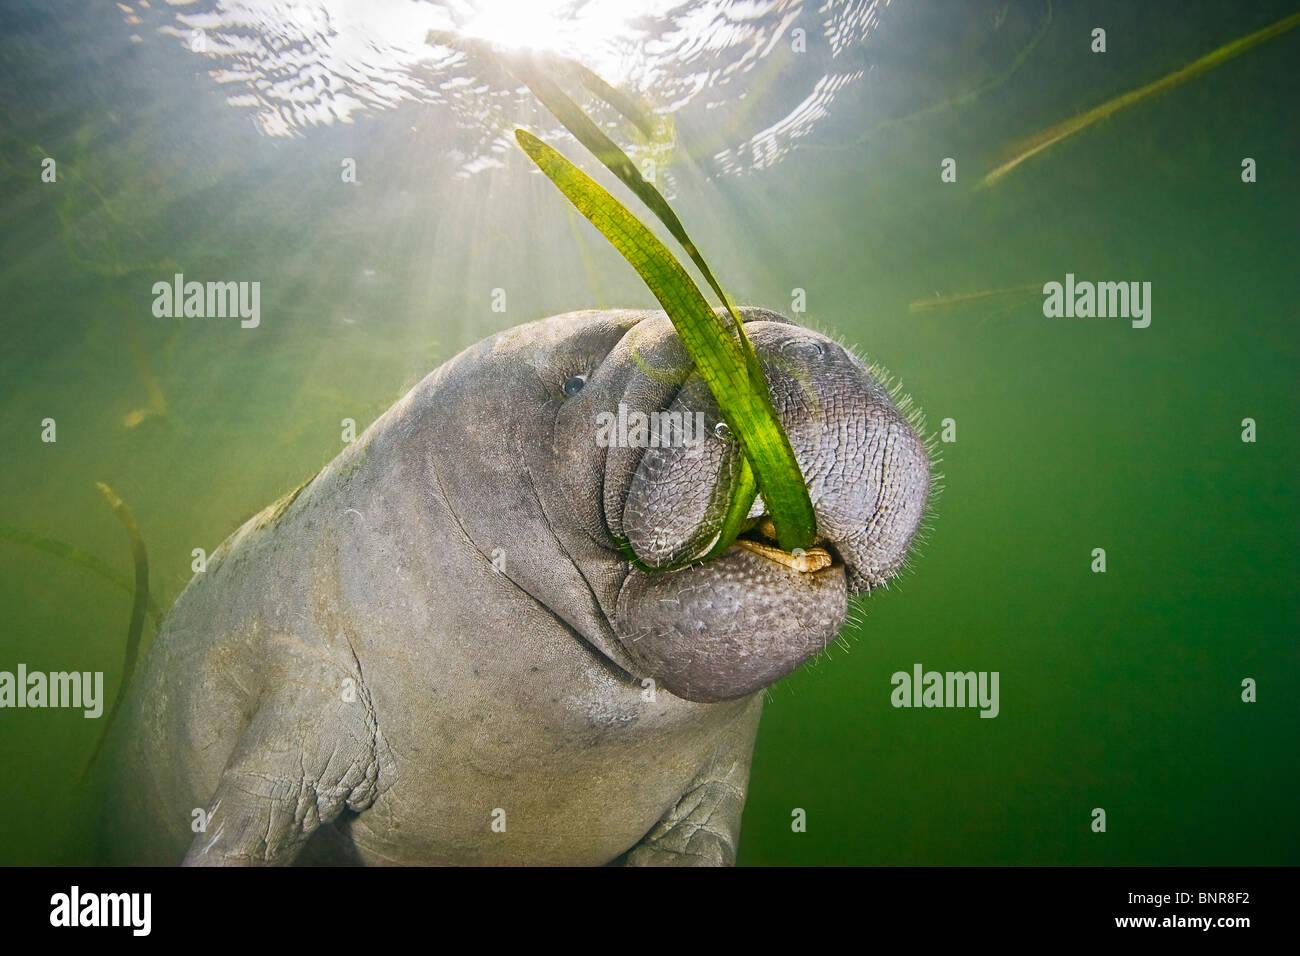 Florida, manatí Trichechus manatus latirostris, ternero alimentándose de algas marinas. Imagen De Stock